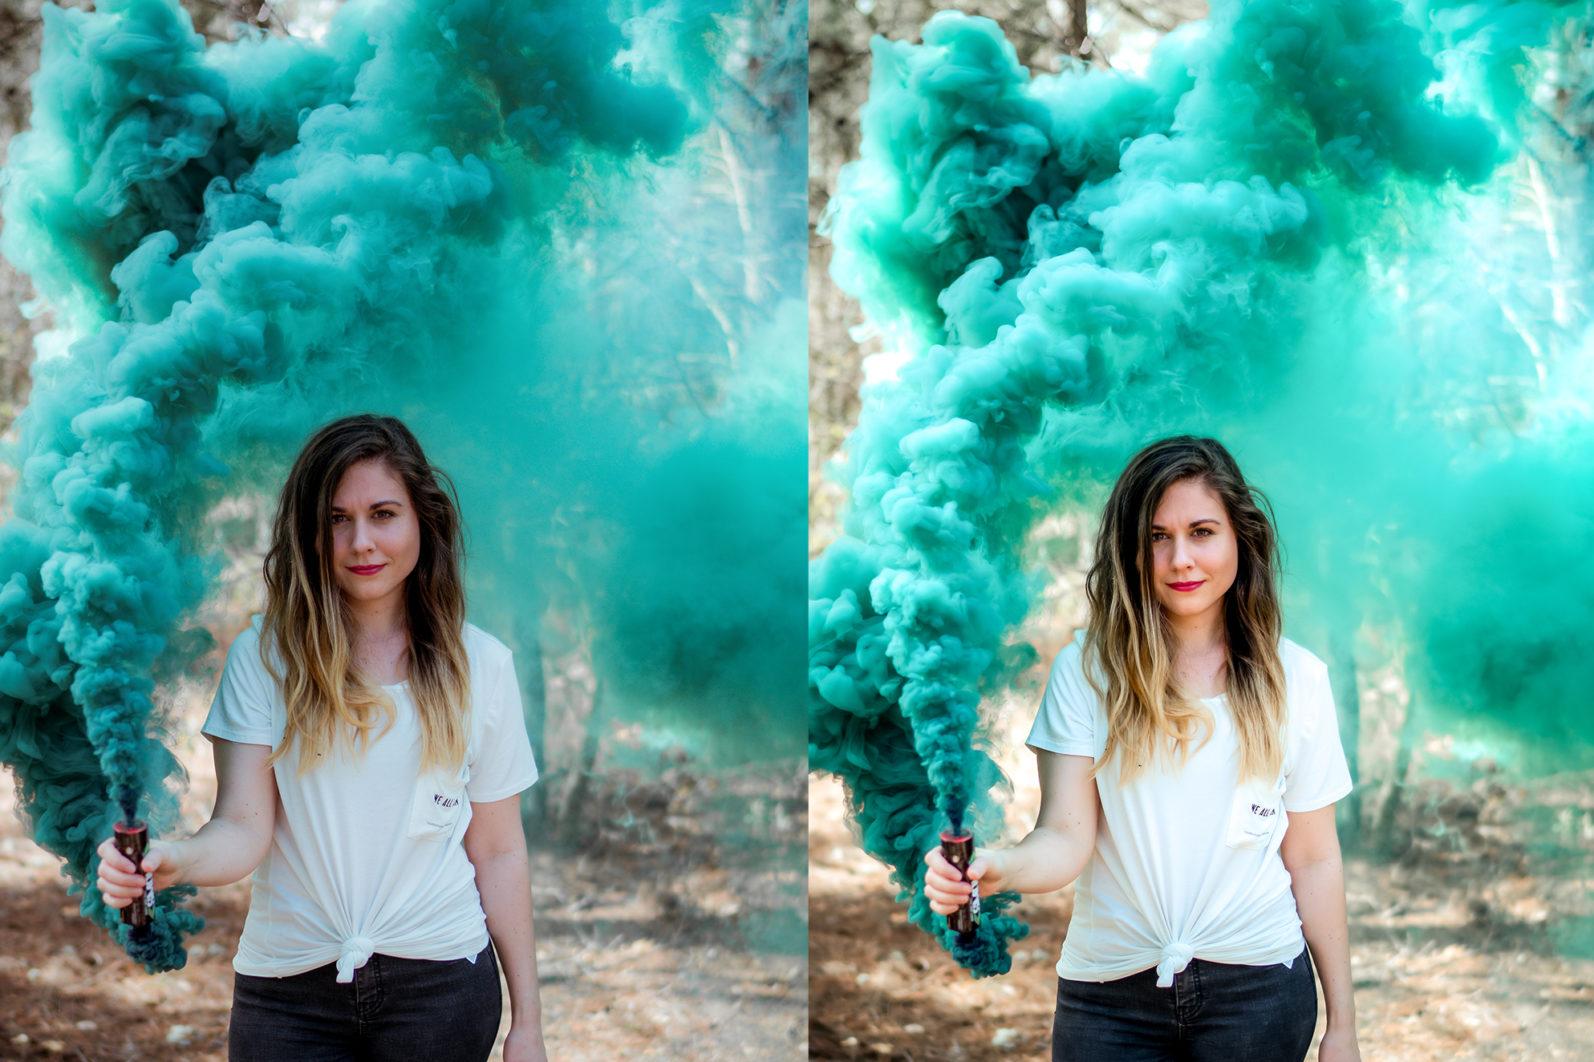 12 Smoke Bomb Lightroom Presets to enhance your Smoke Bomb Photoshoots - Preview 1 39 -